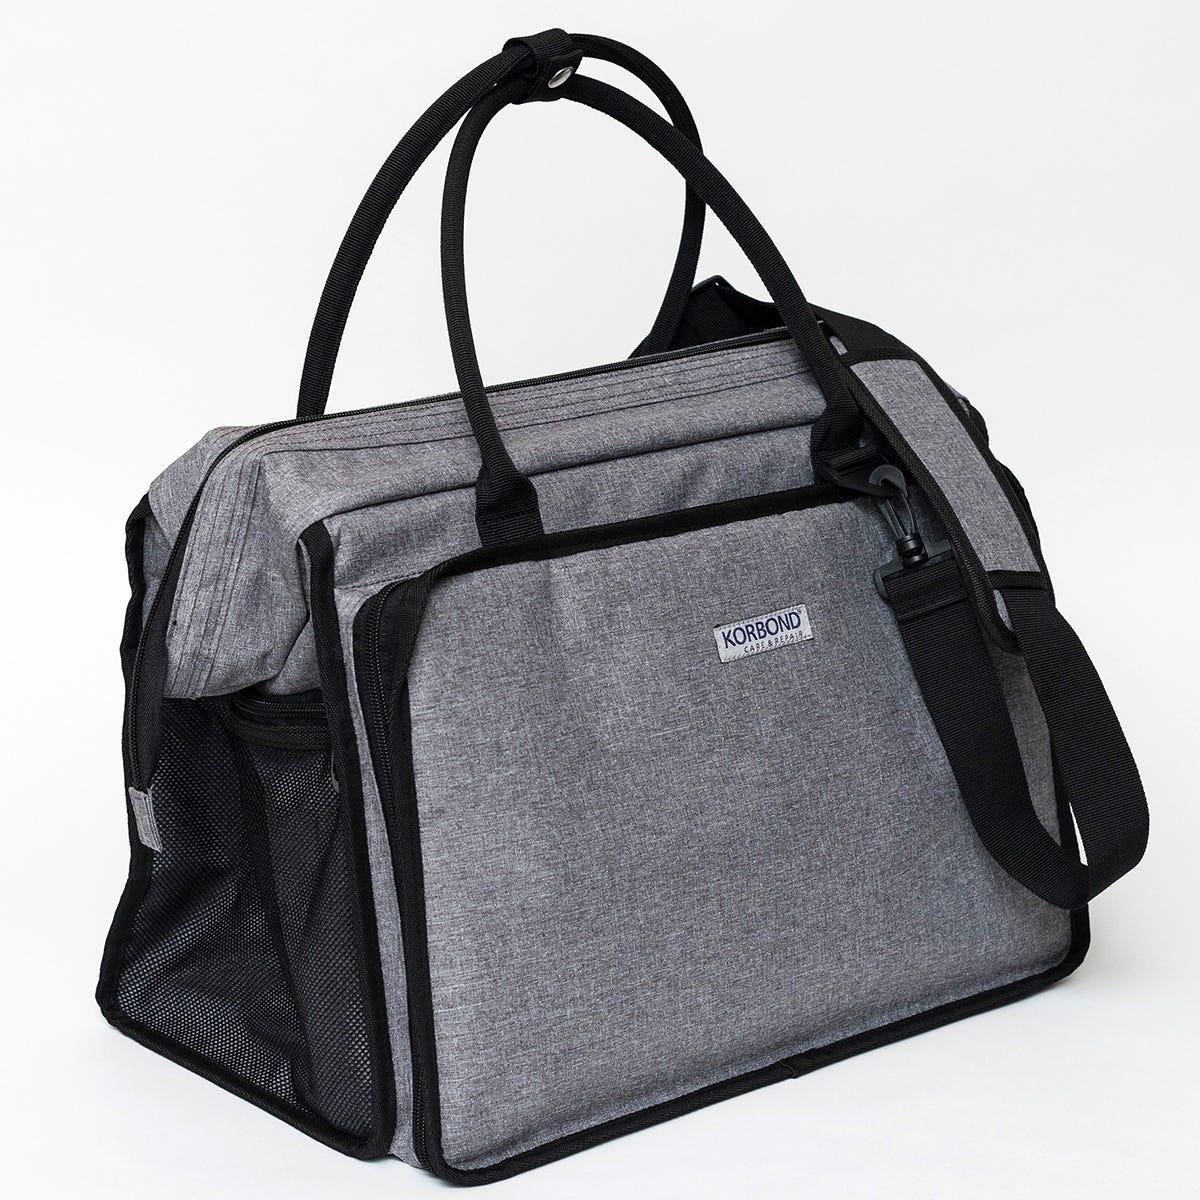 Korbond Grey Sewing Machine Bag